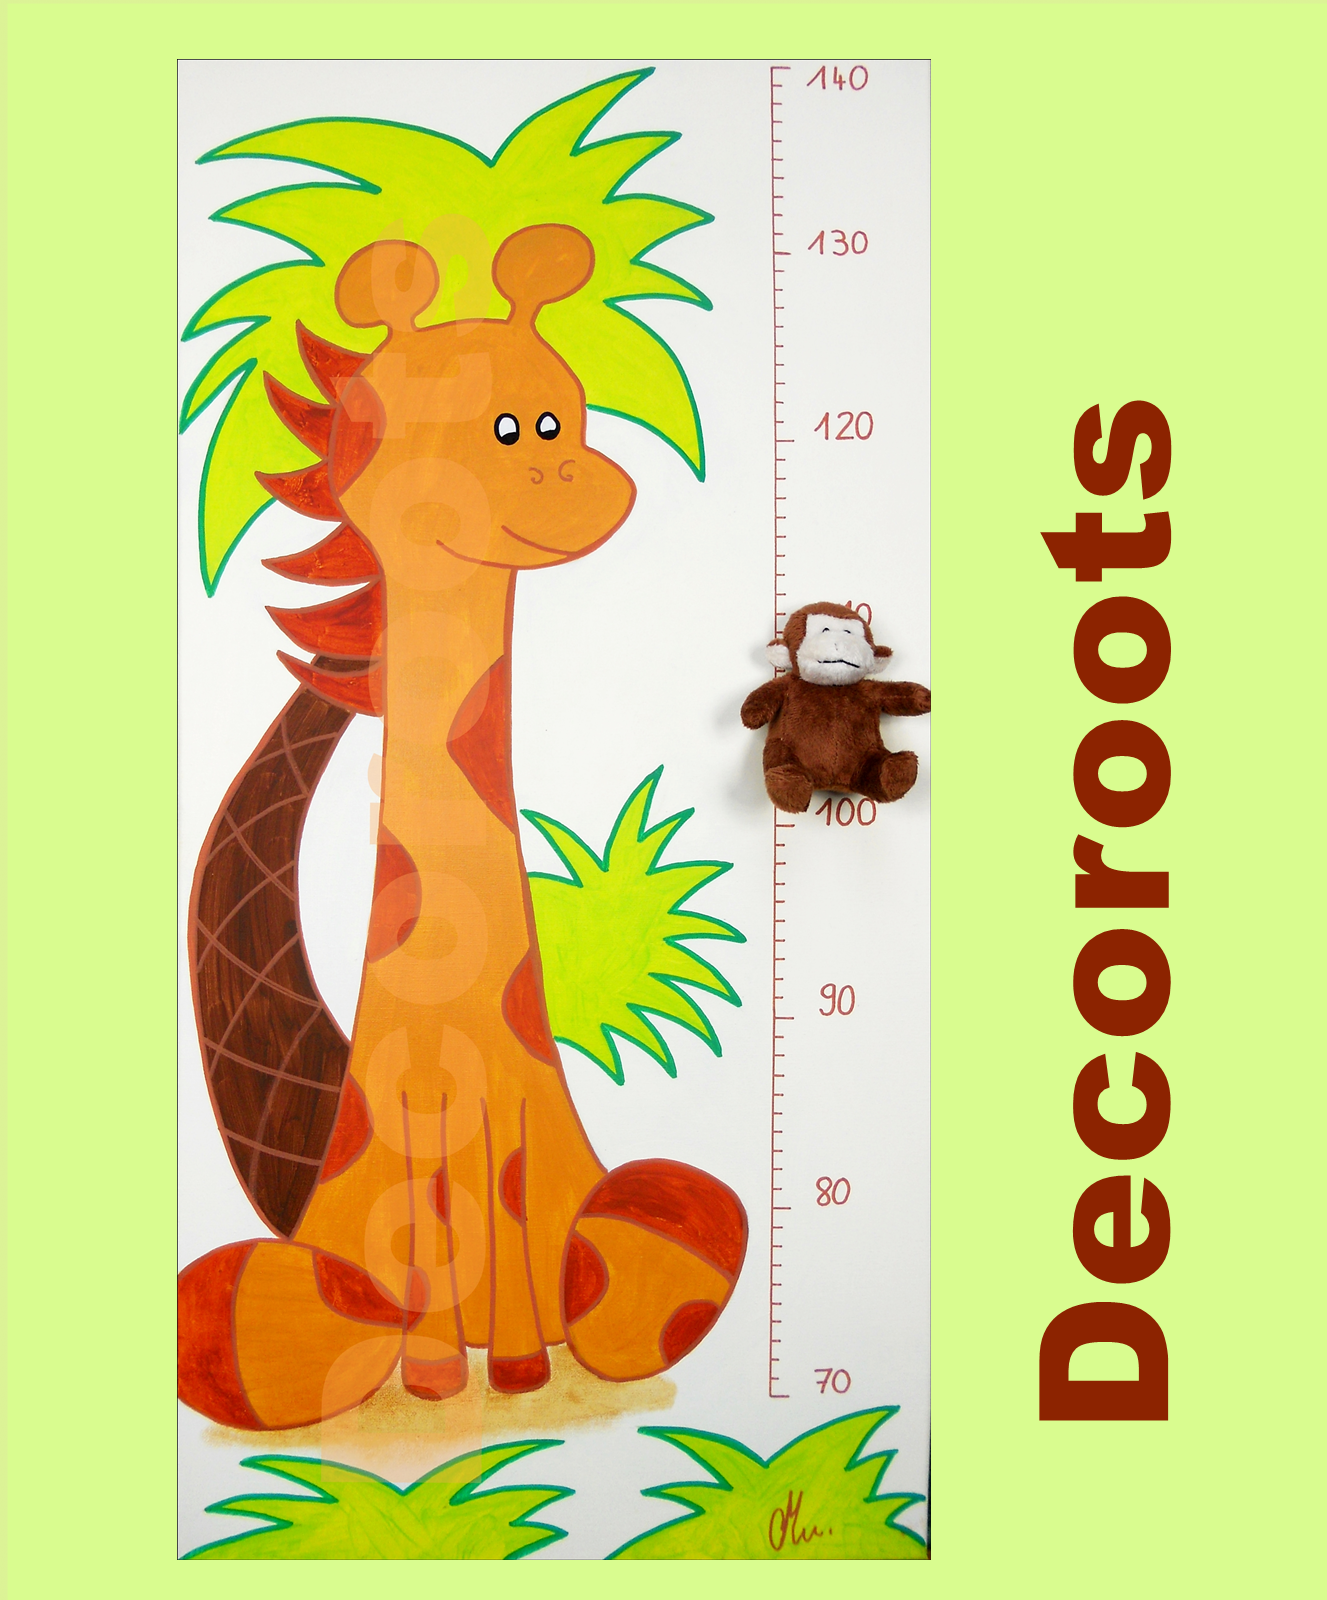 toise-enfant-bebe-theme-jungle-girafe-et-elephant-peluche-beige-marron-chocolat-vert-anis-